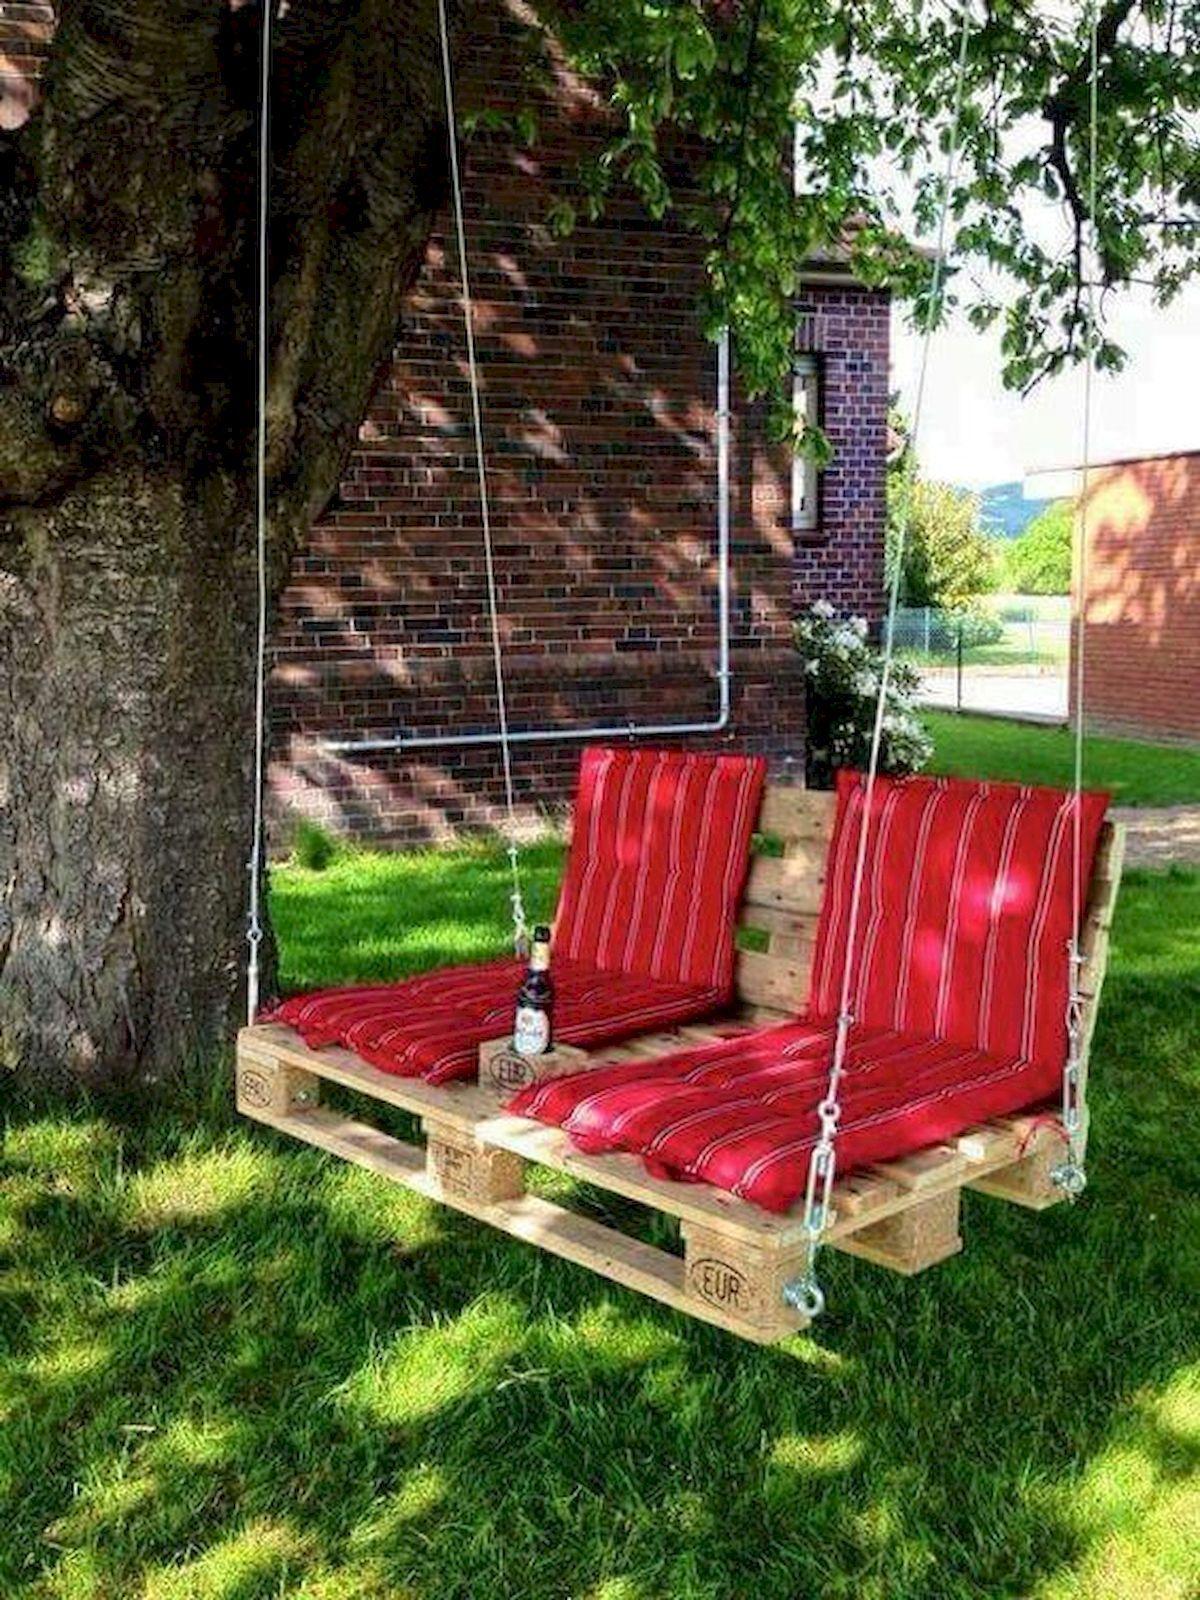 Amazing Diy Projects Pallet Swings Design Ideas 5 Backyard Diy Projects Backyard Projects Diy Backyard